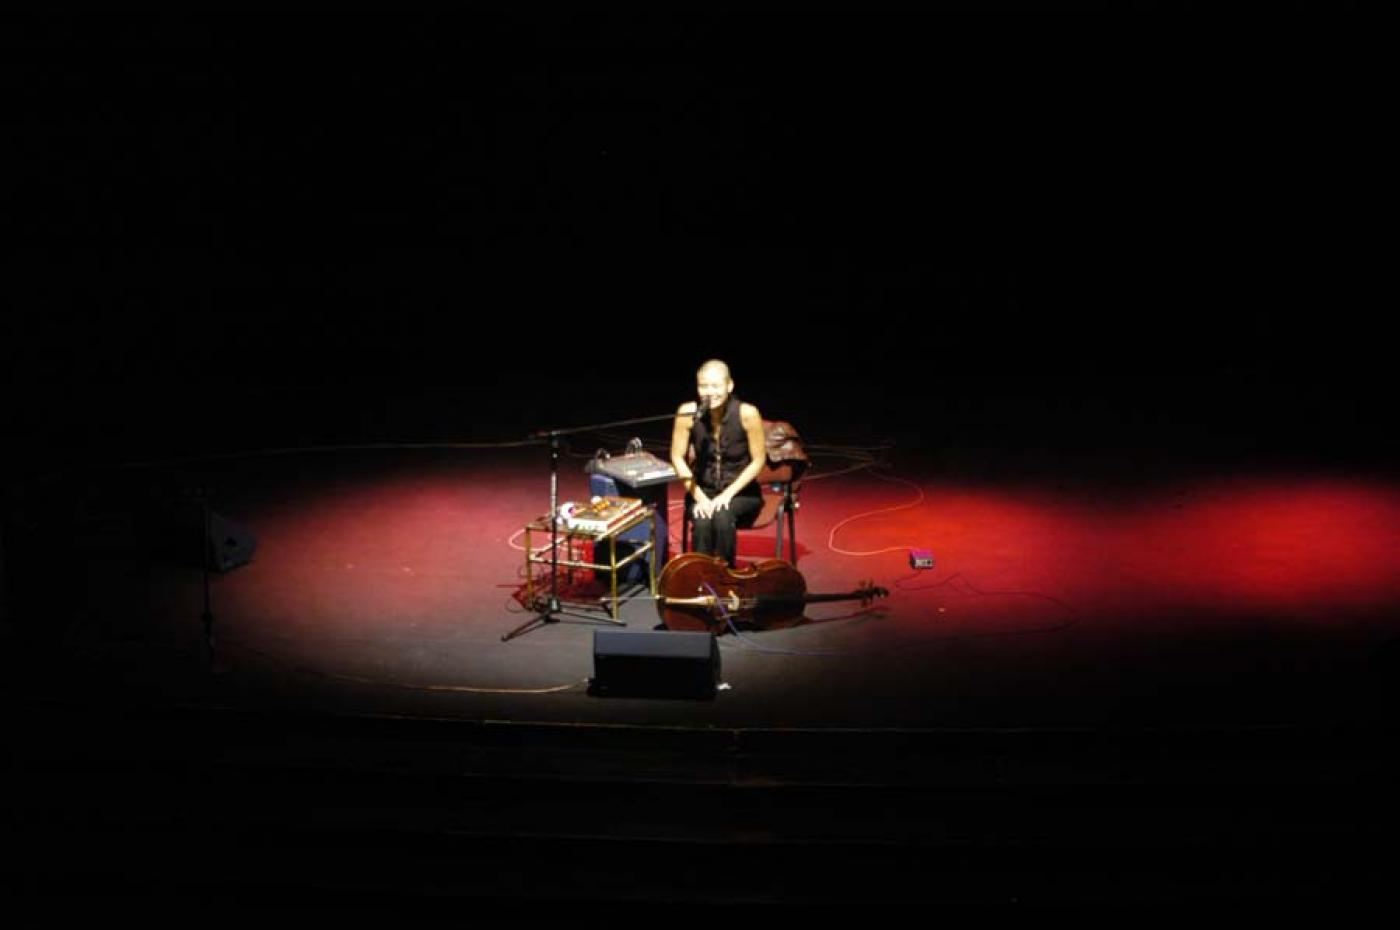 Audrey Chen, zdjęcia, 2007